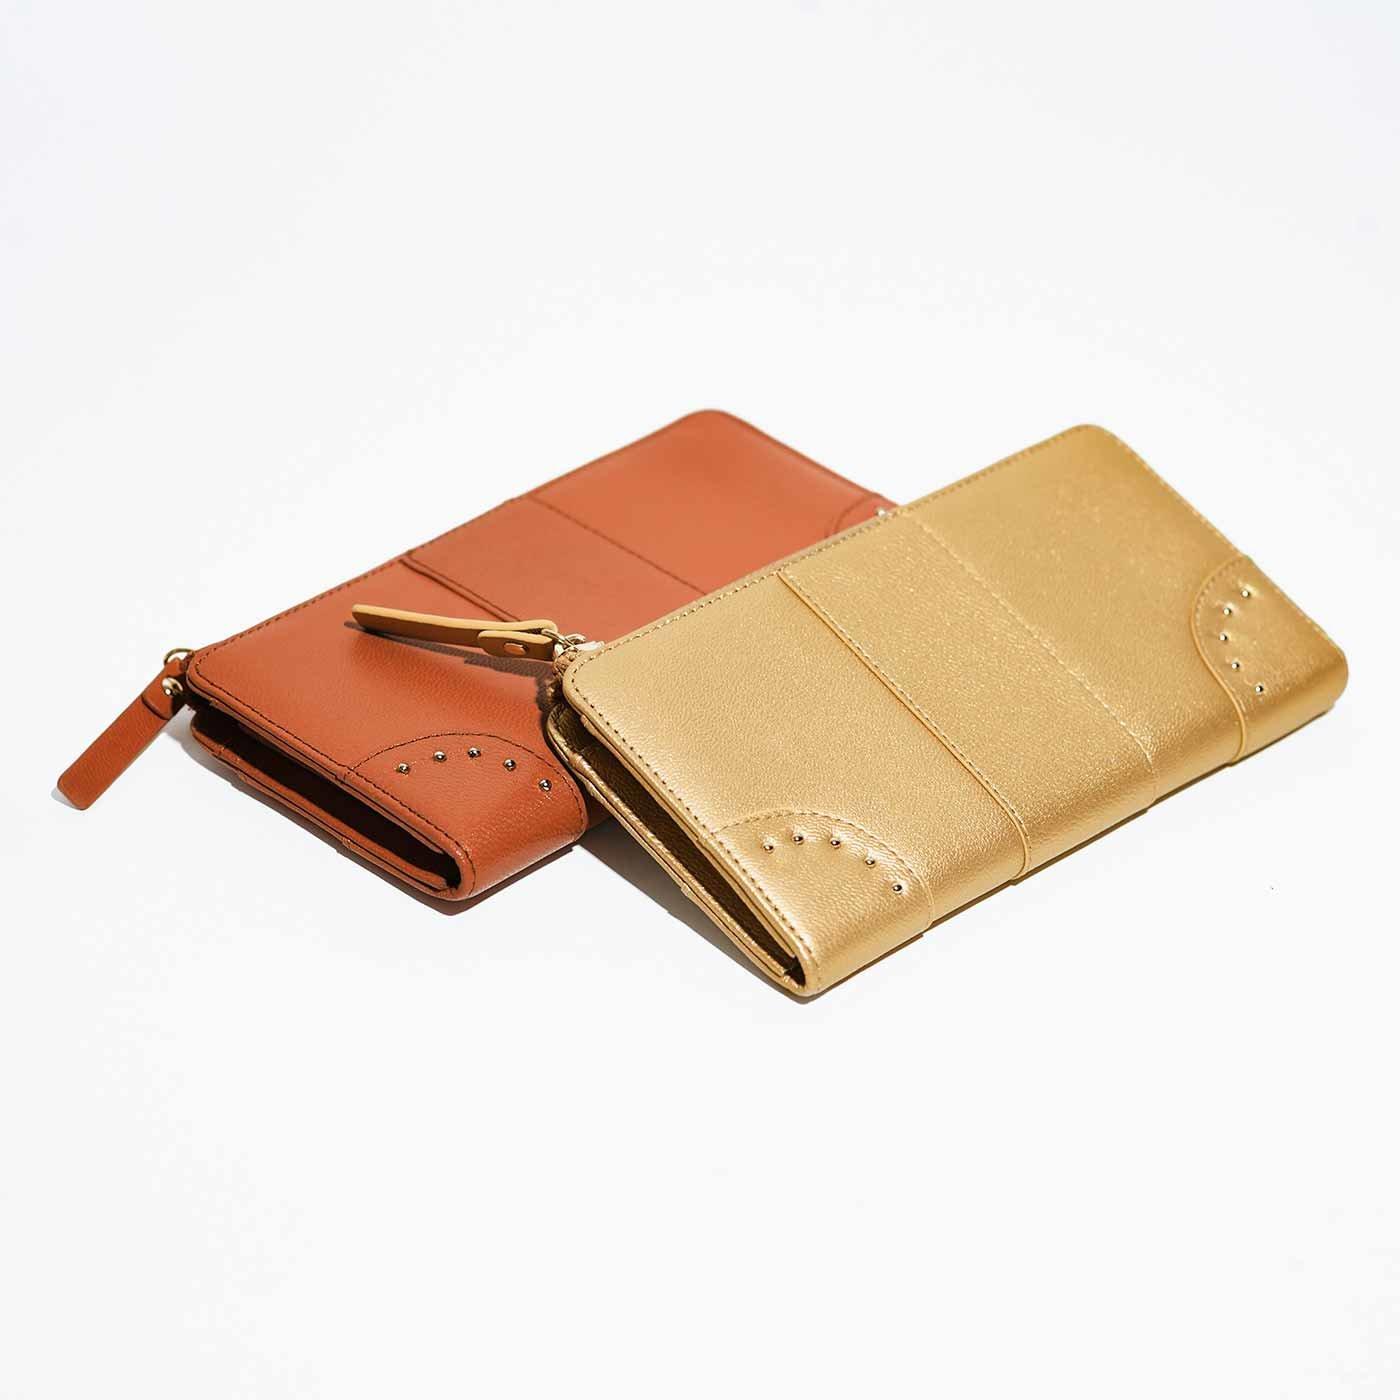 IEDIT[イディット]  ファスナー開きがワンアクションで使いやすい すっきり大人本革財布〈キャメルオレンジ〉